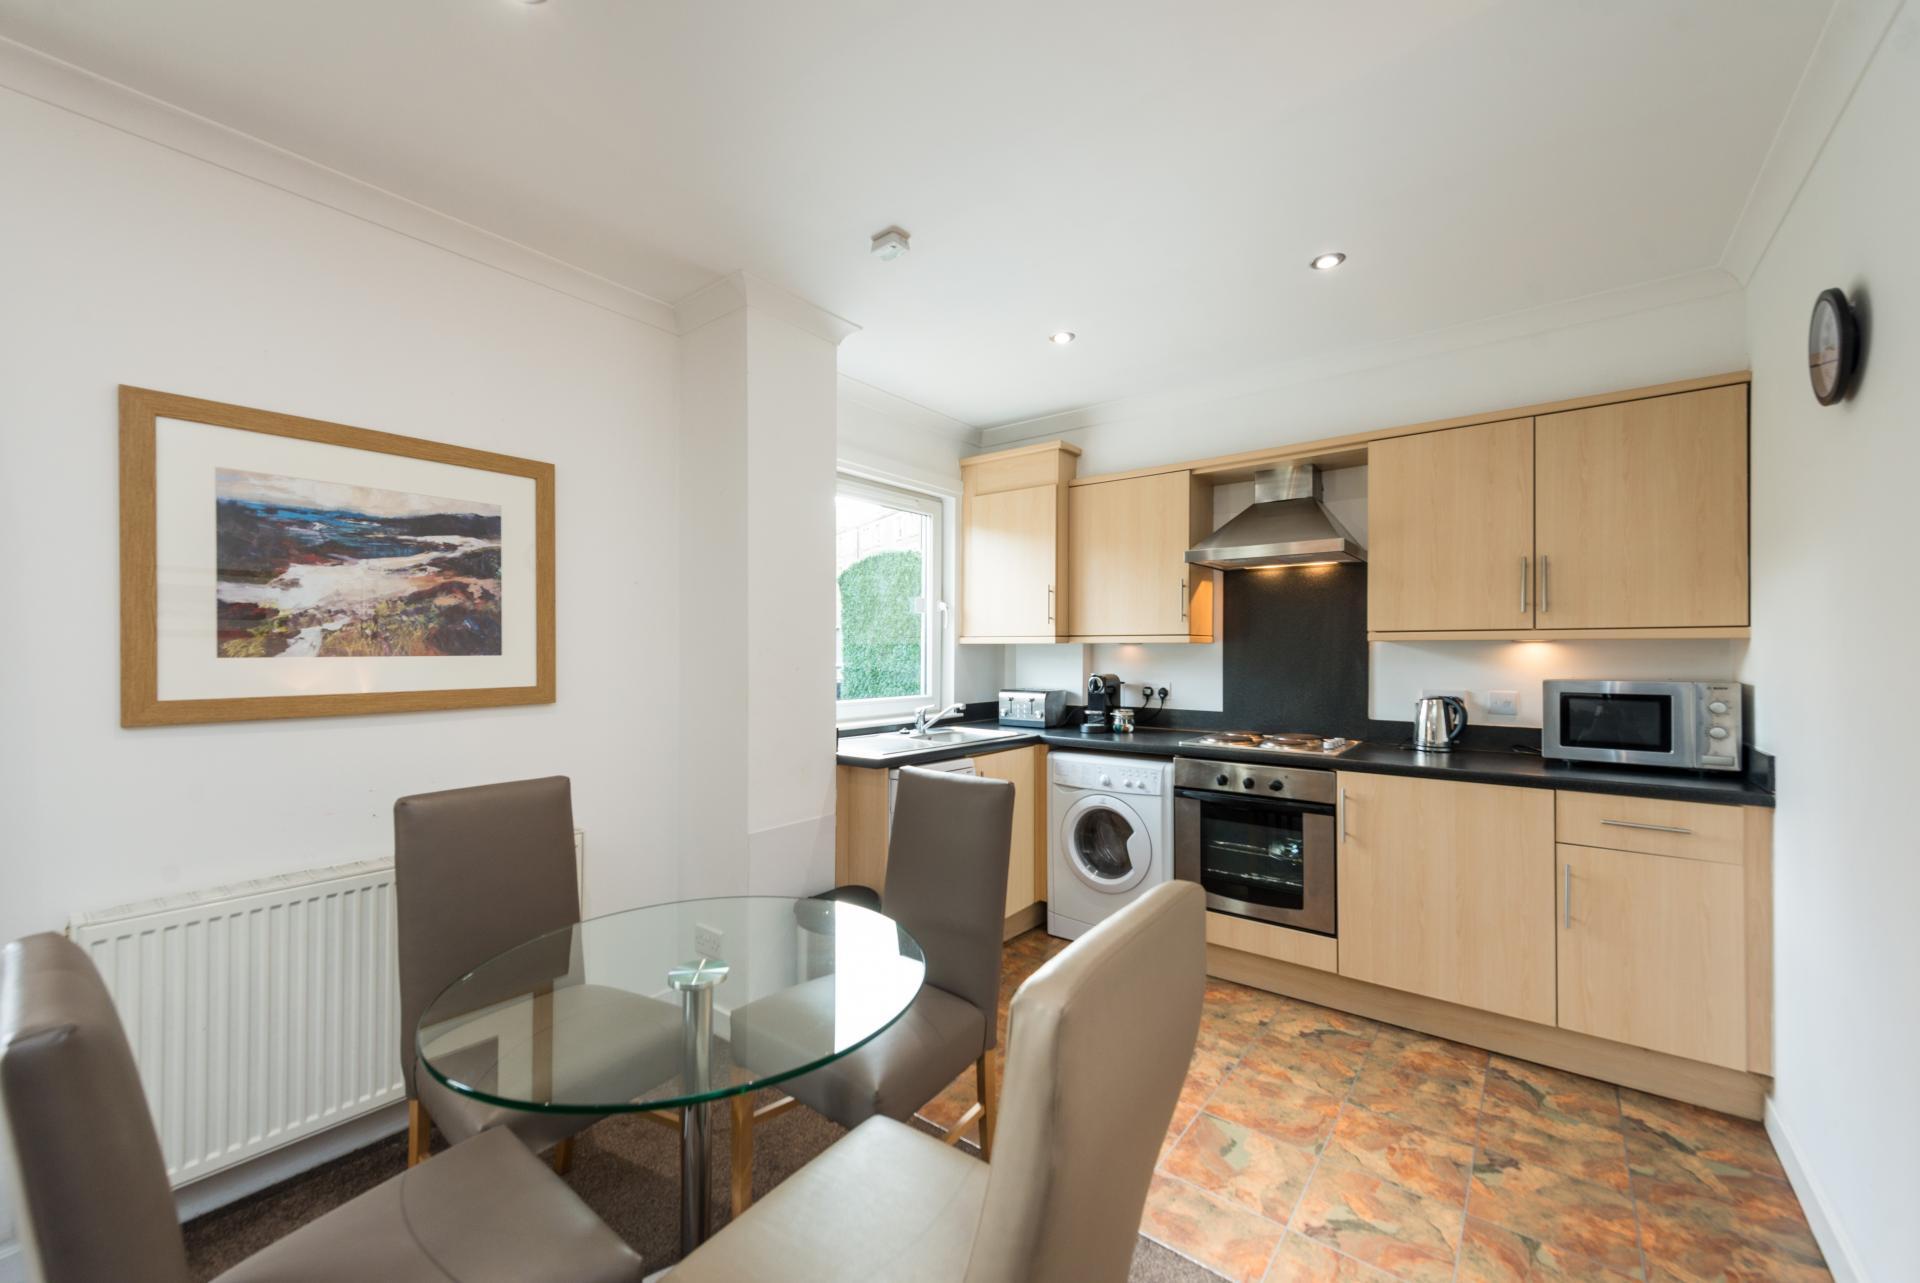 Kitchen at Harris Apartments - Citybase Apartments